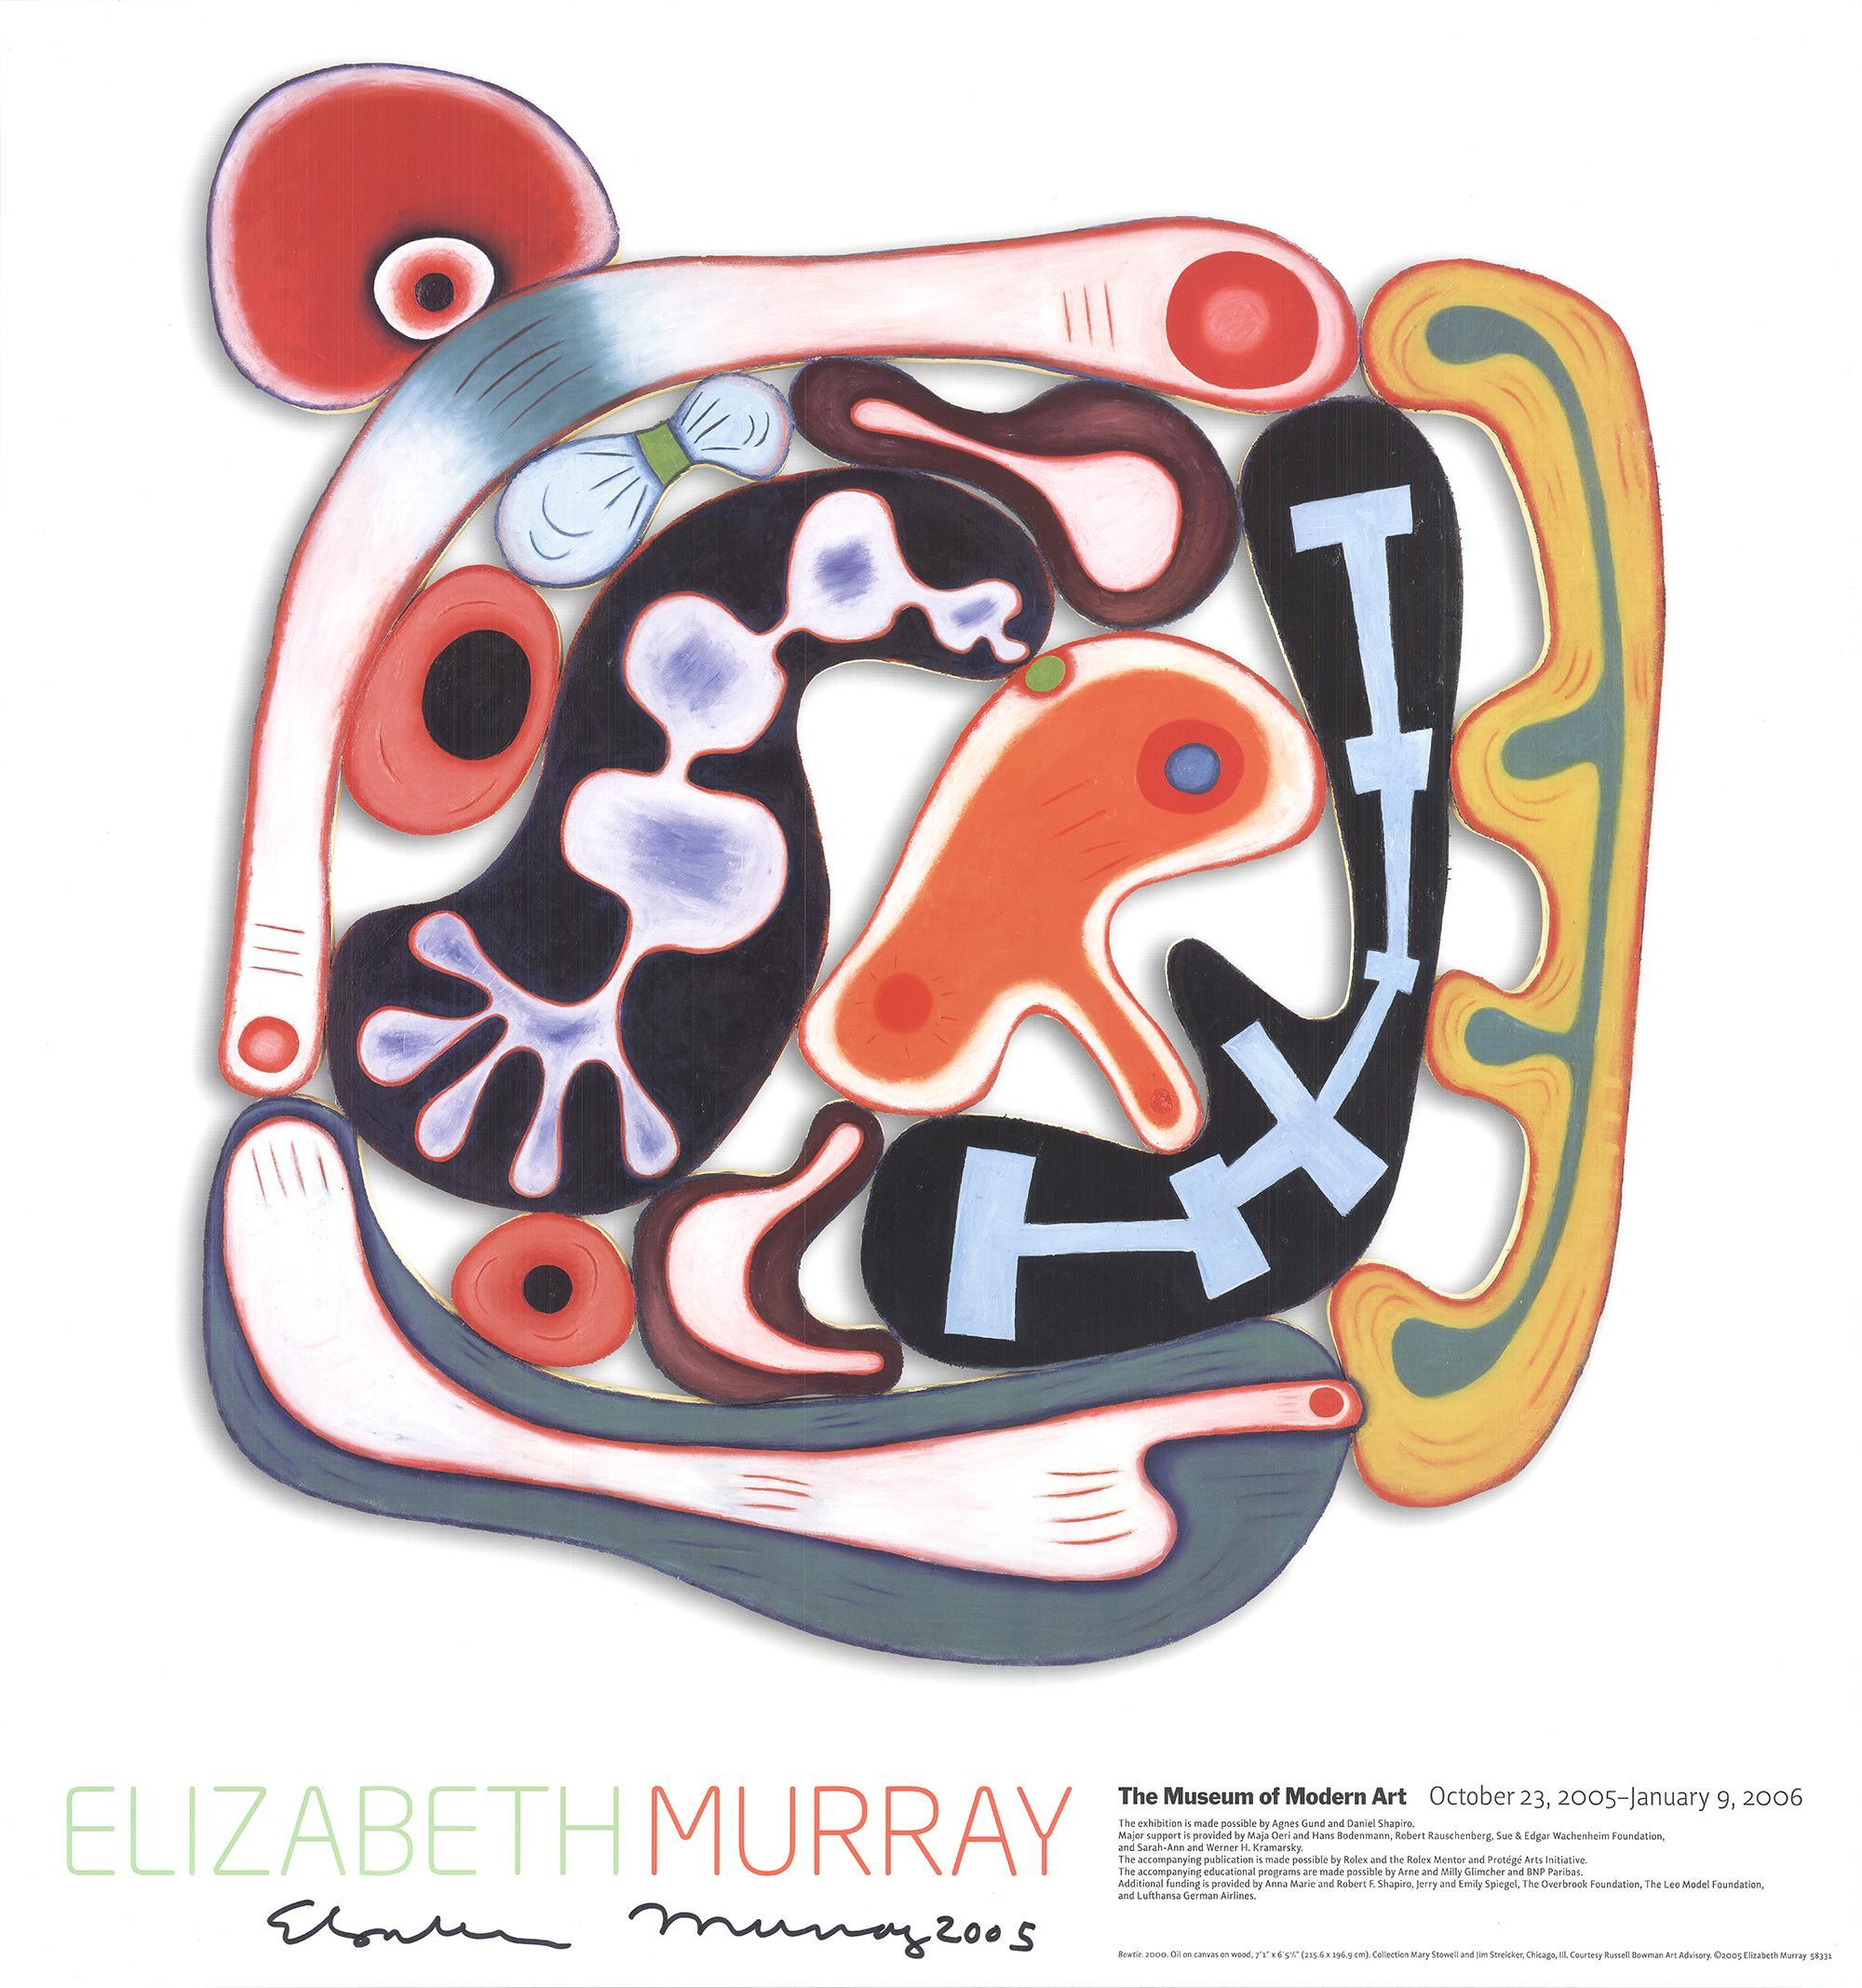 "Elizabeth Murray-Bowtie-32"" x 30""-Offset Lithograph-2005-Abstract-sculpture"